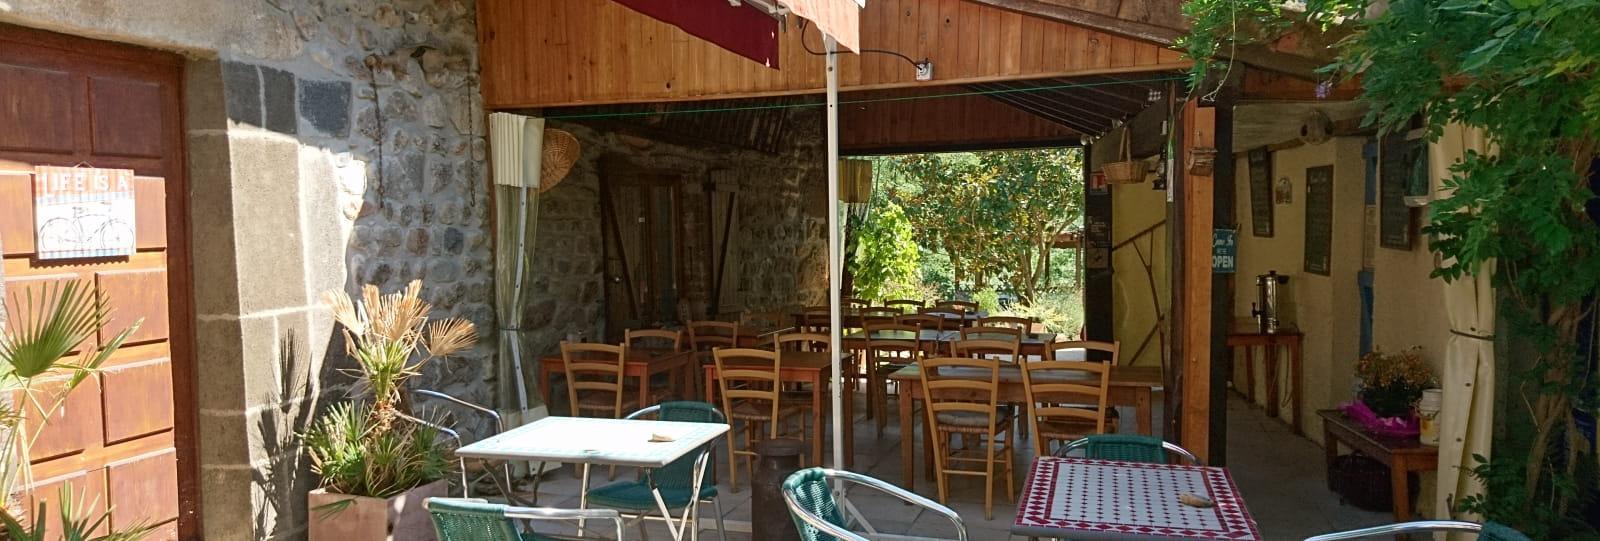 Restaurant - Camping Le Viaduc